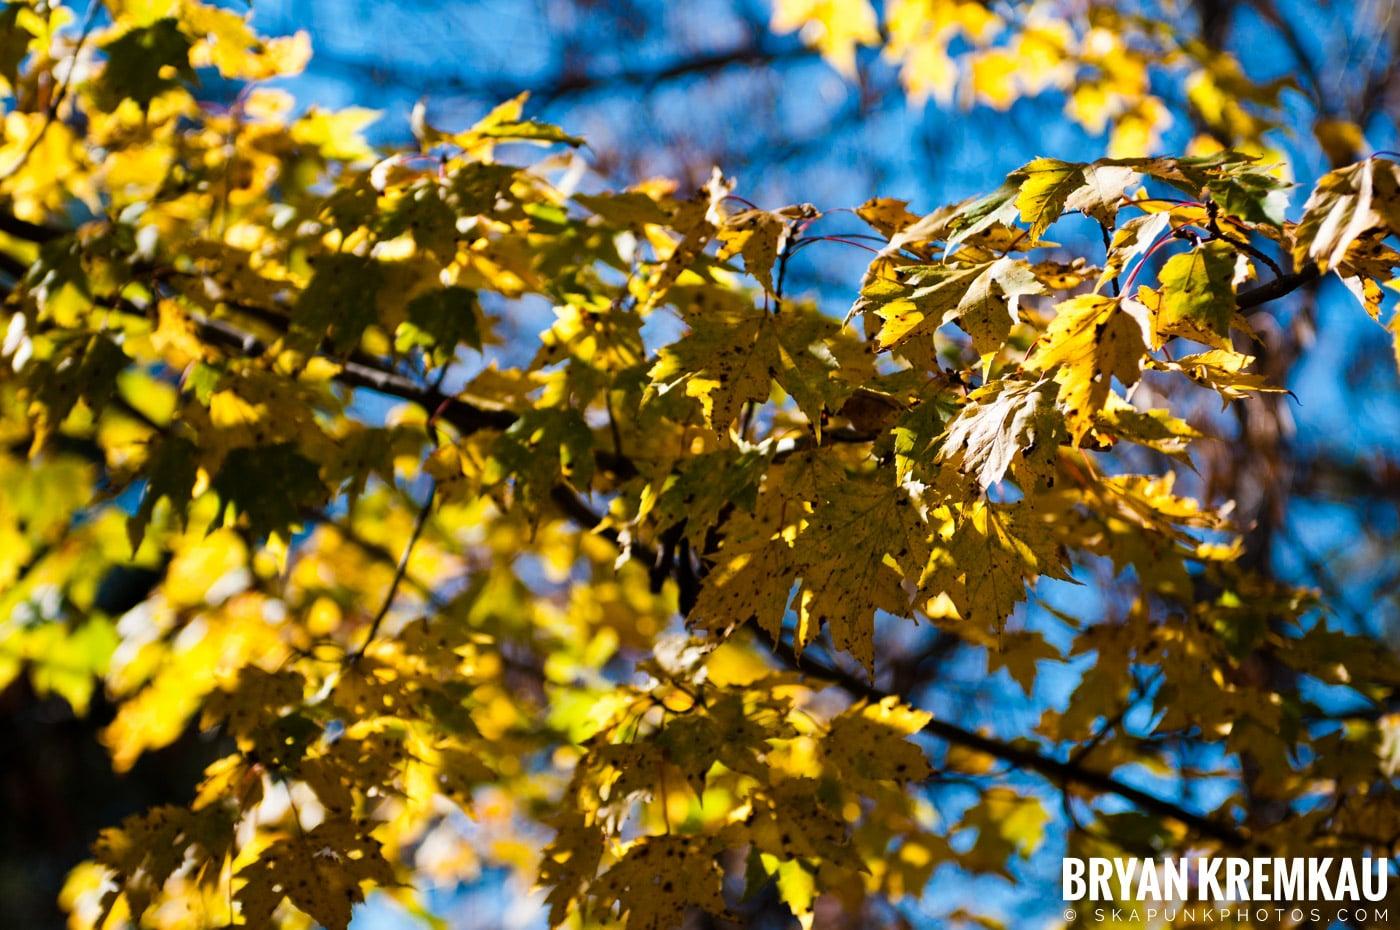 Minnewaska State Park Preserve @ Wawarsing, New York - 10.22.11 (13)